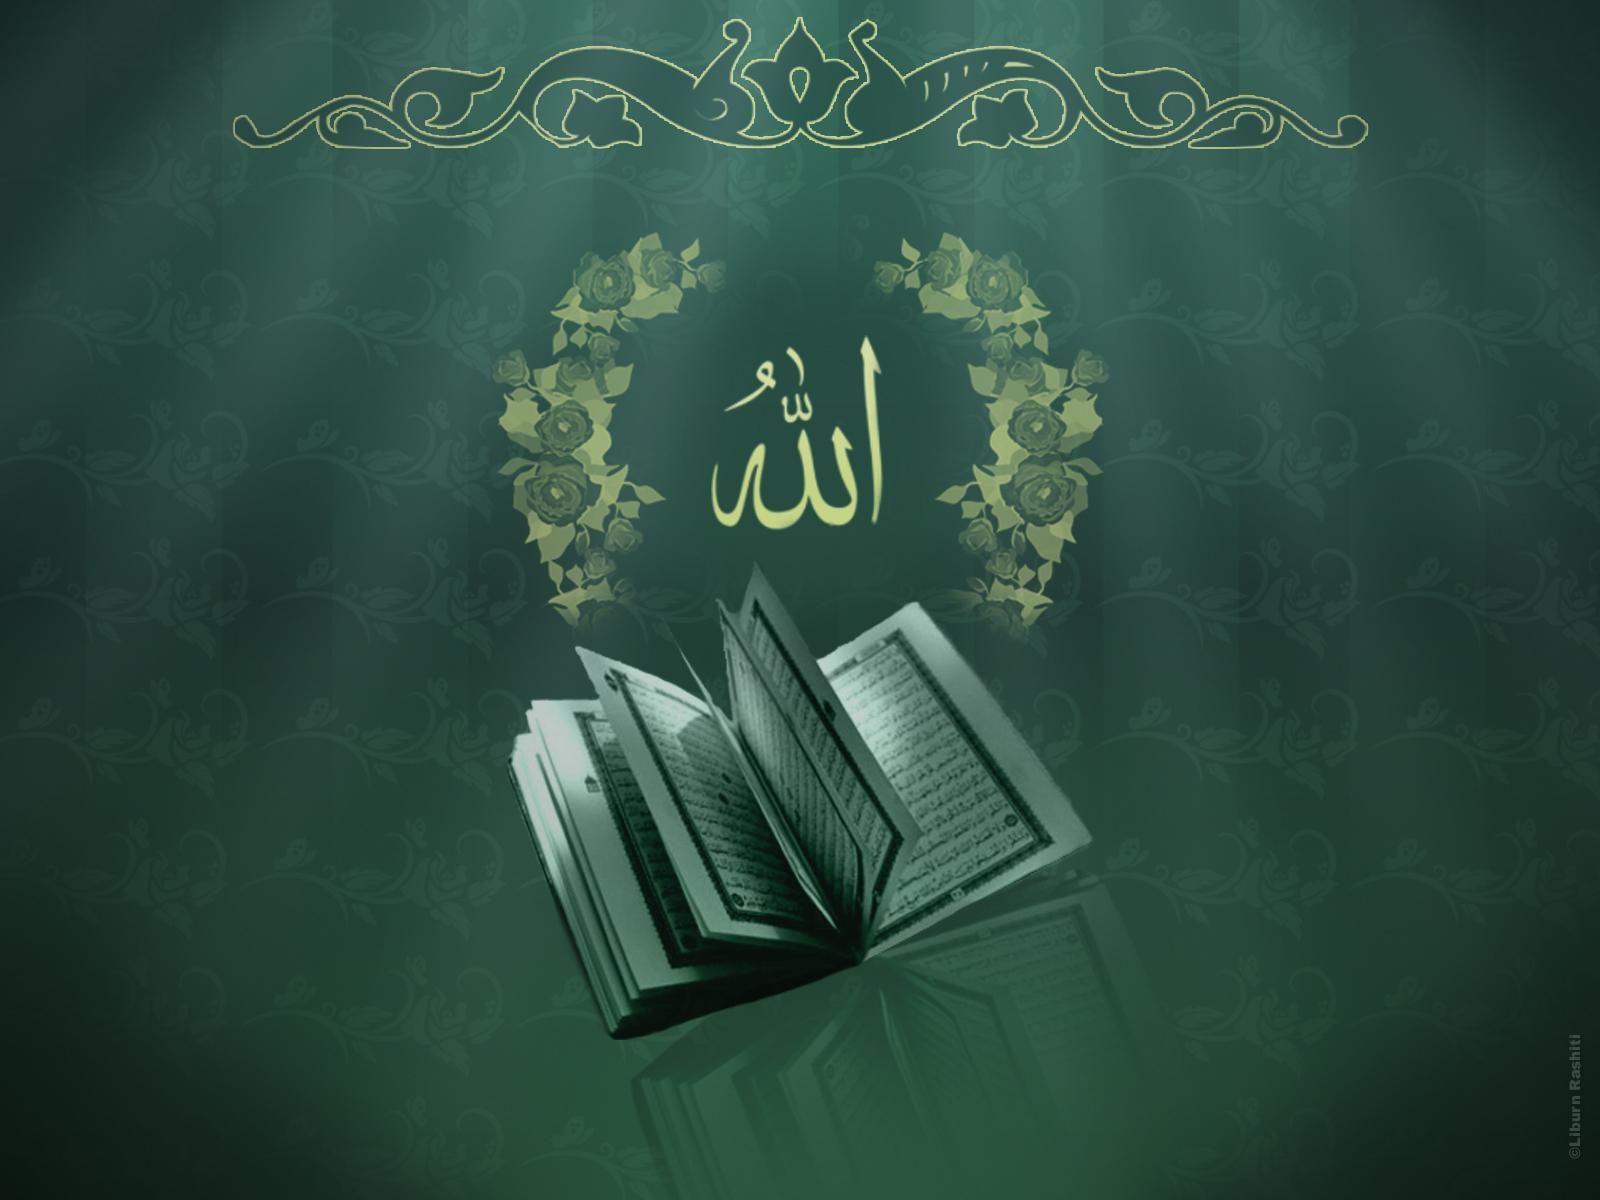 http://2.bp.blogspot.com/-KBylEICjntA/TmGhGfj0xhI/AAAAAAAAFUQ/sAfraNS2B7U/s1600/Islamic-Wallpapers--05.jpg